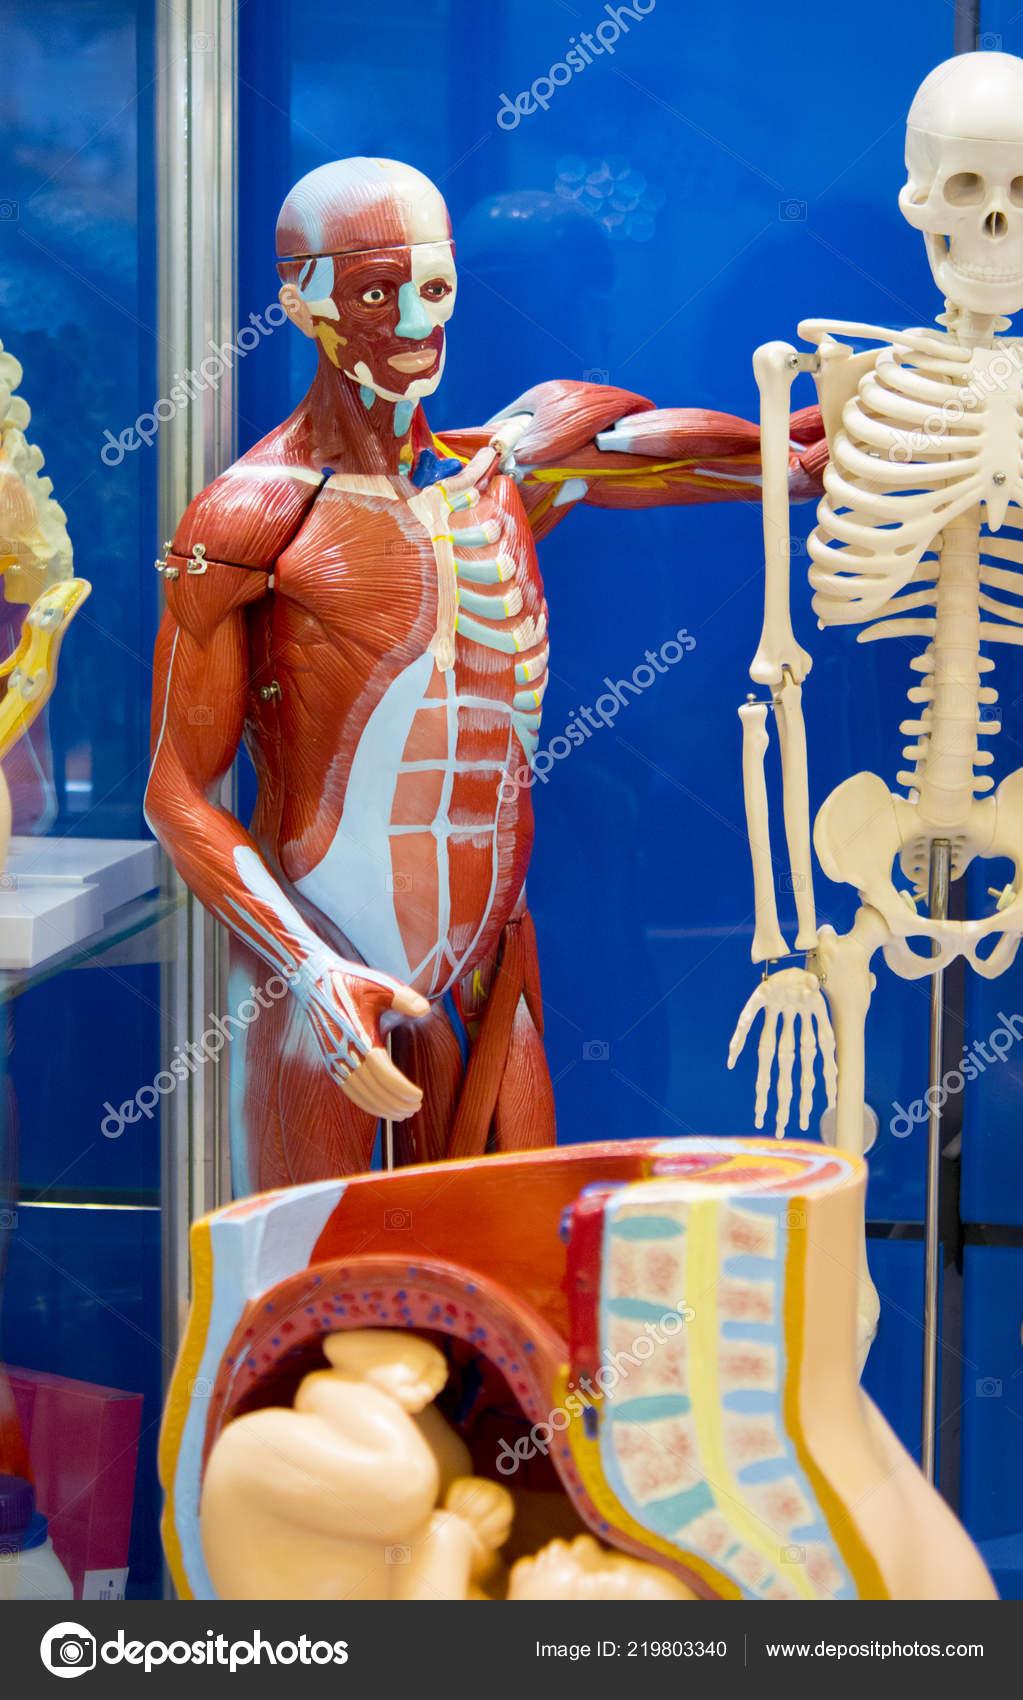 Estructura De Anatomía Humana Foto De Stock Marina1408